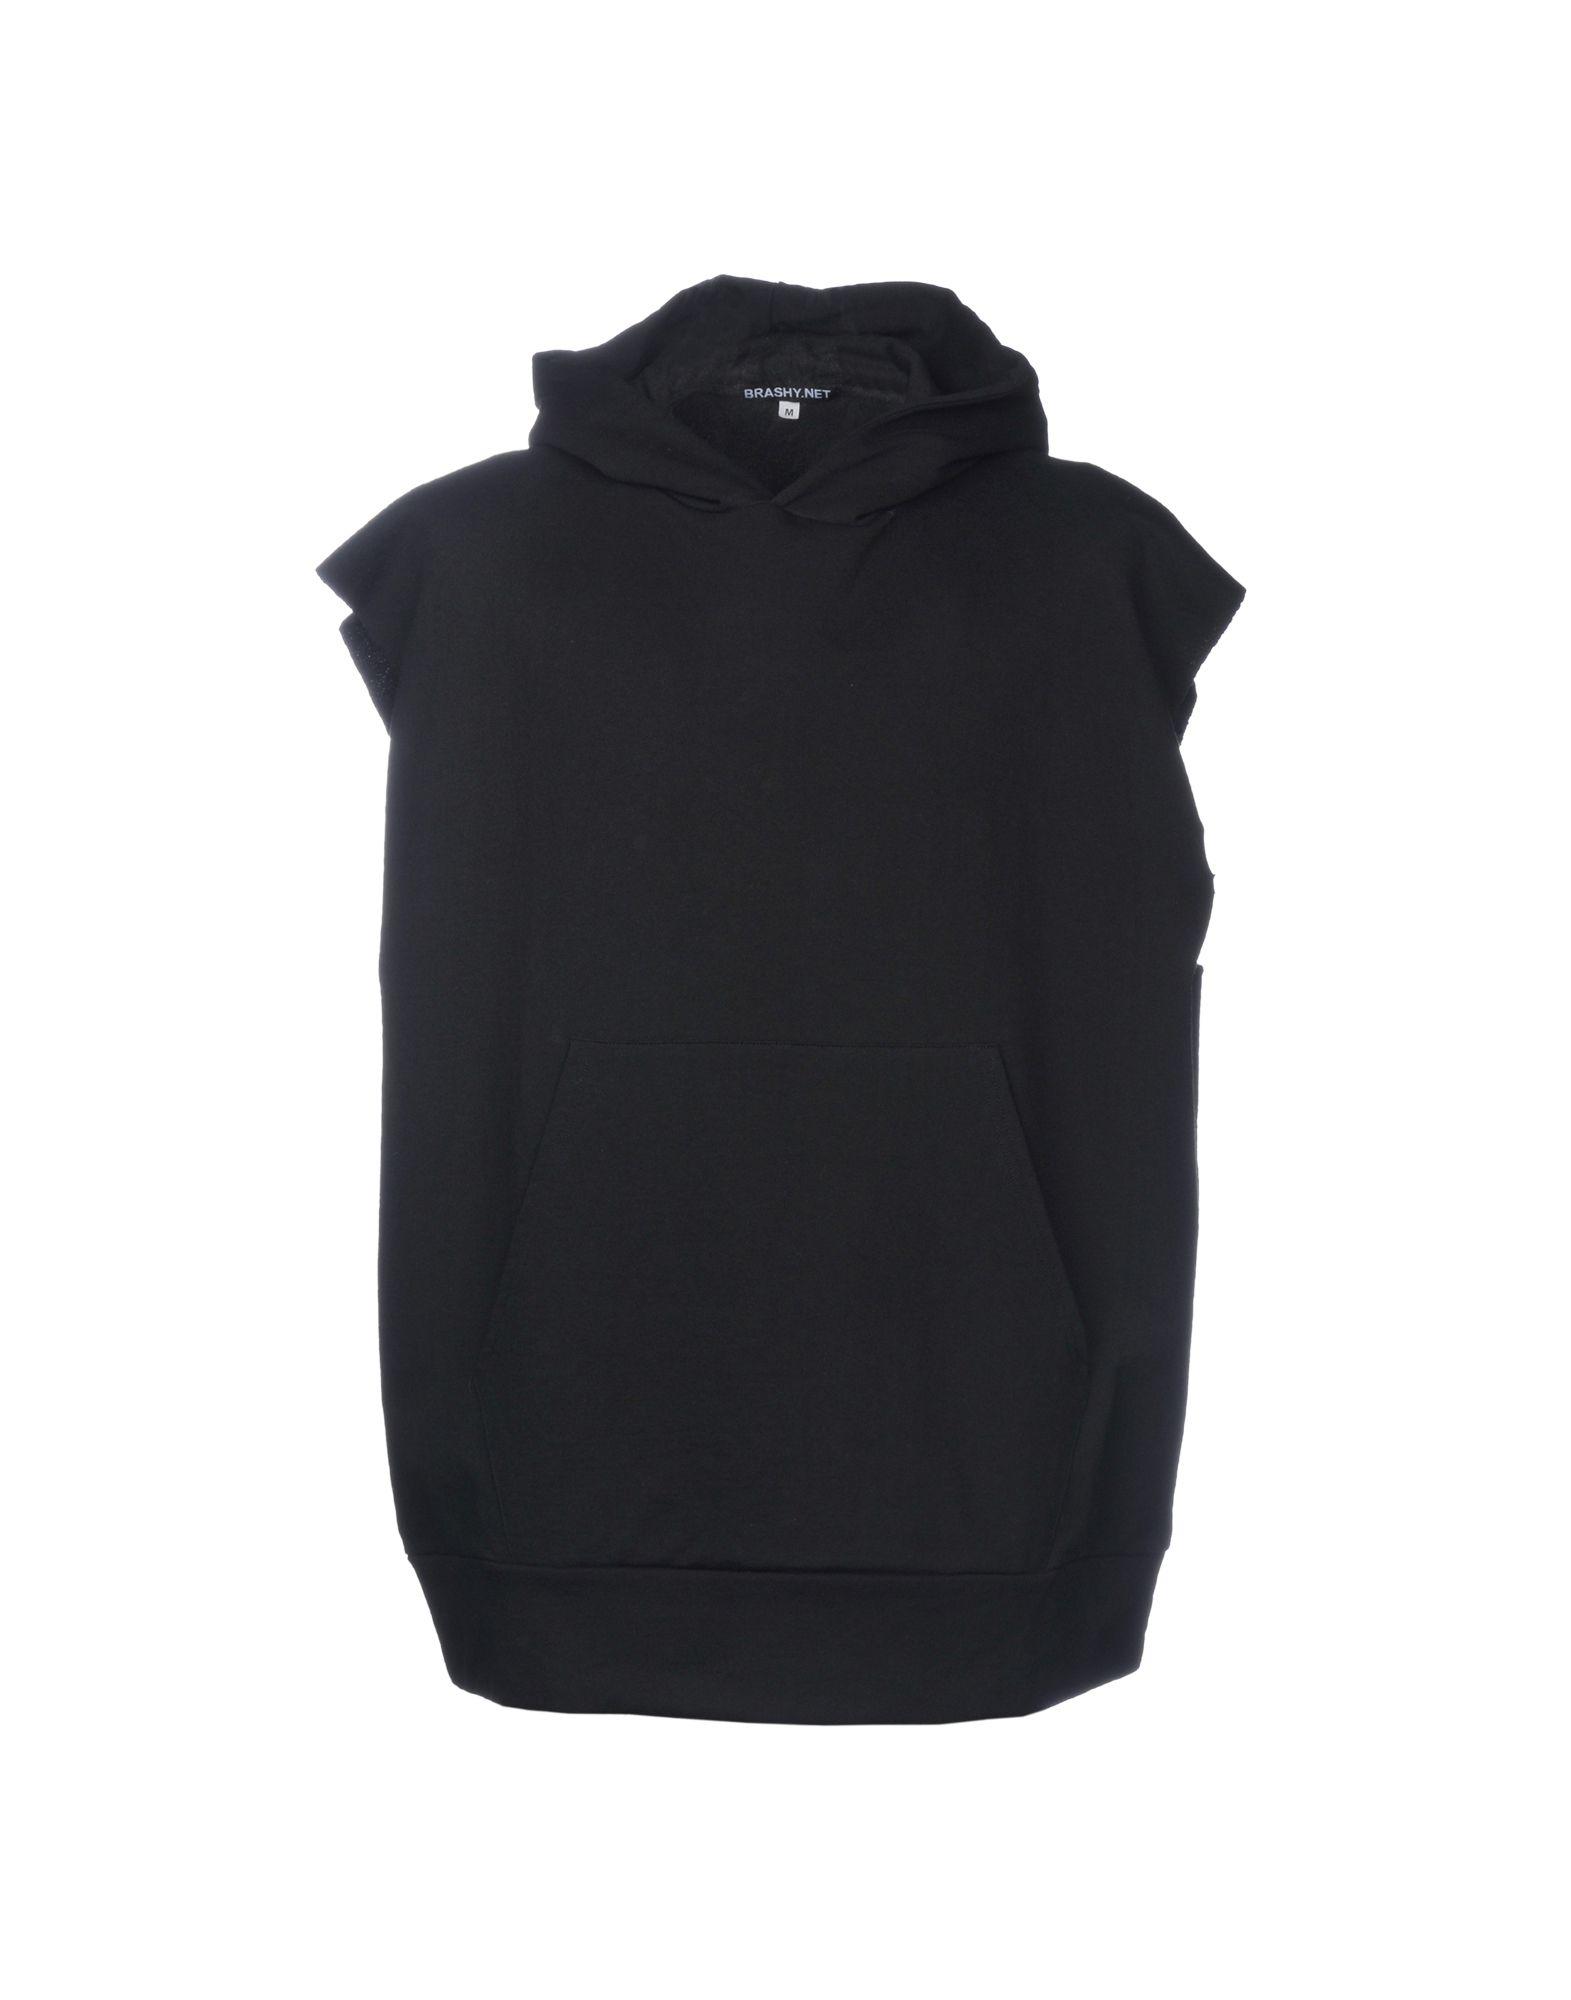 BRASHY Sweatshirts in Black